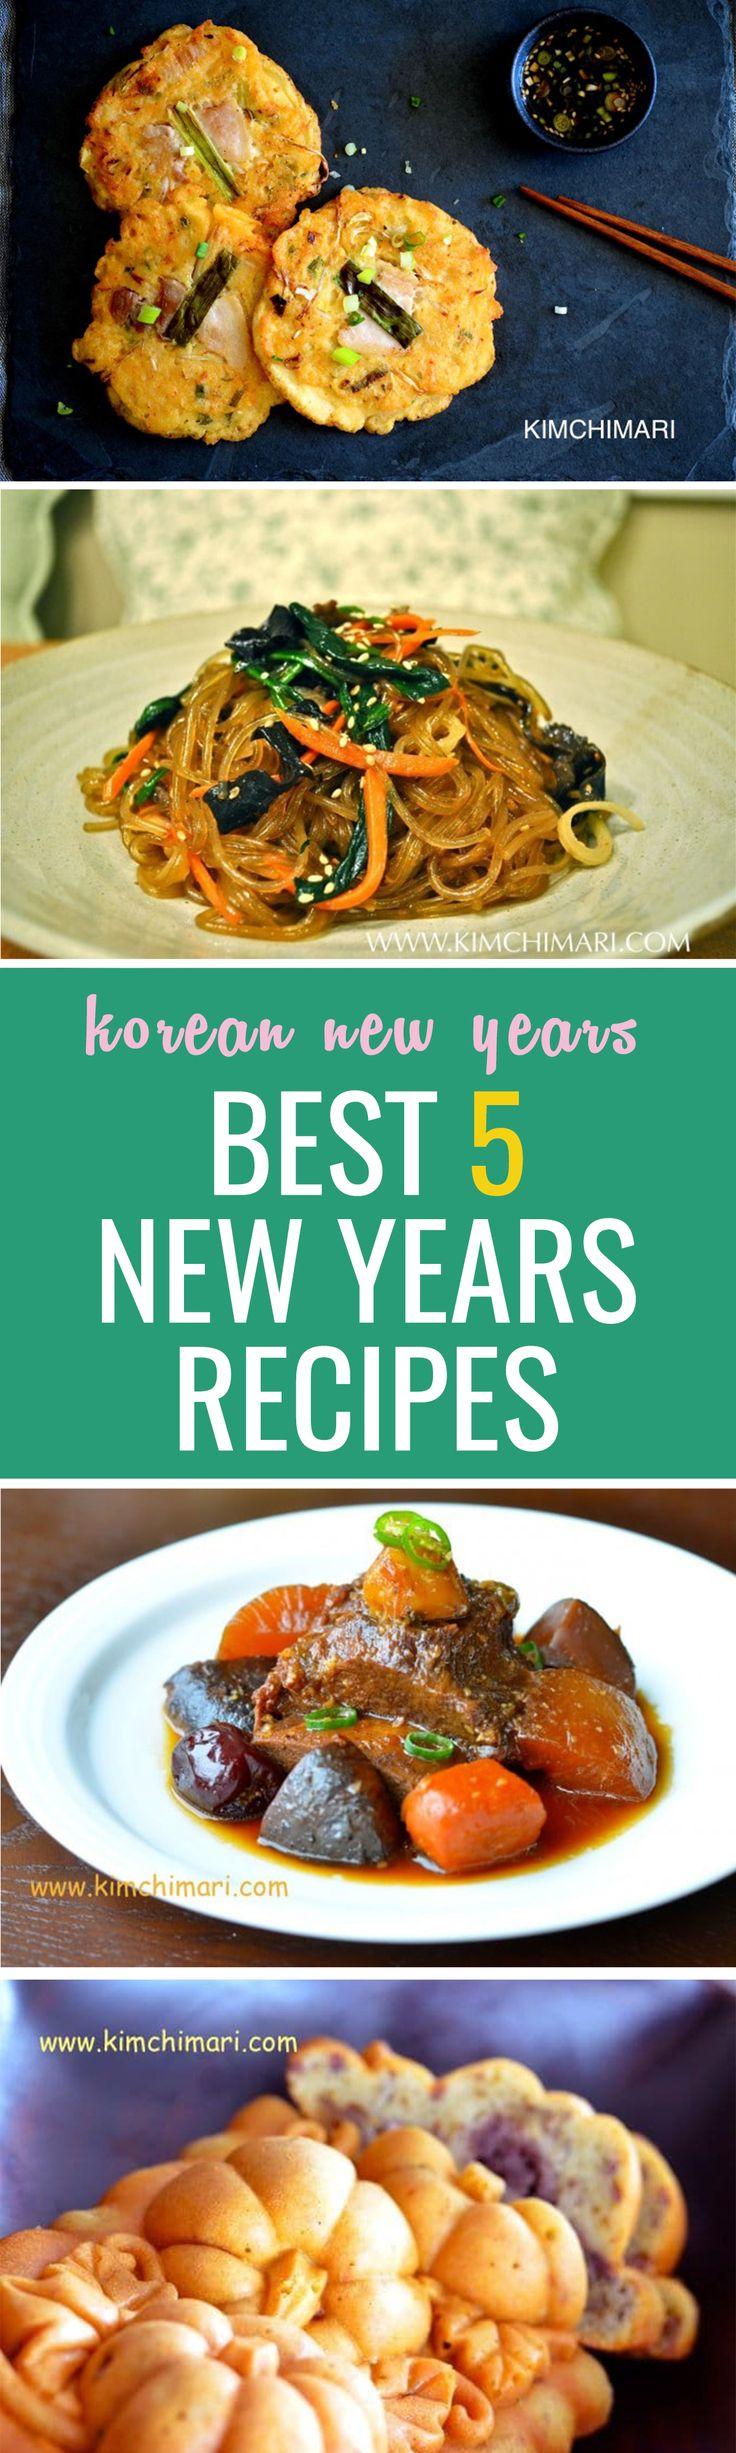 54 best korean party food images on pinterest korean recipes best 5 korean new year recipes rice cake soup jeons japchae kalbijjim and geotjori make a fabulous korean new year party menu forumfinder Gallery